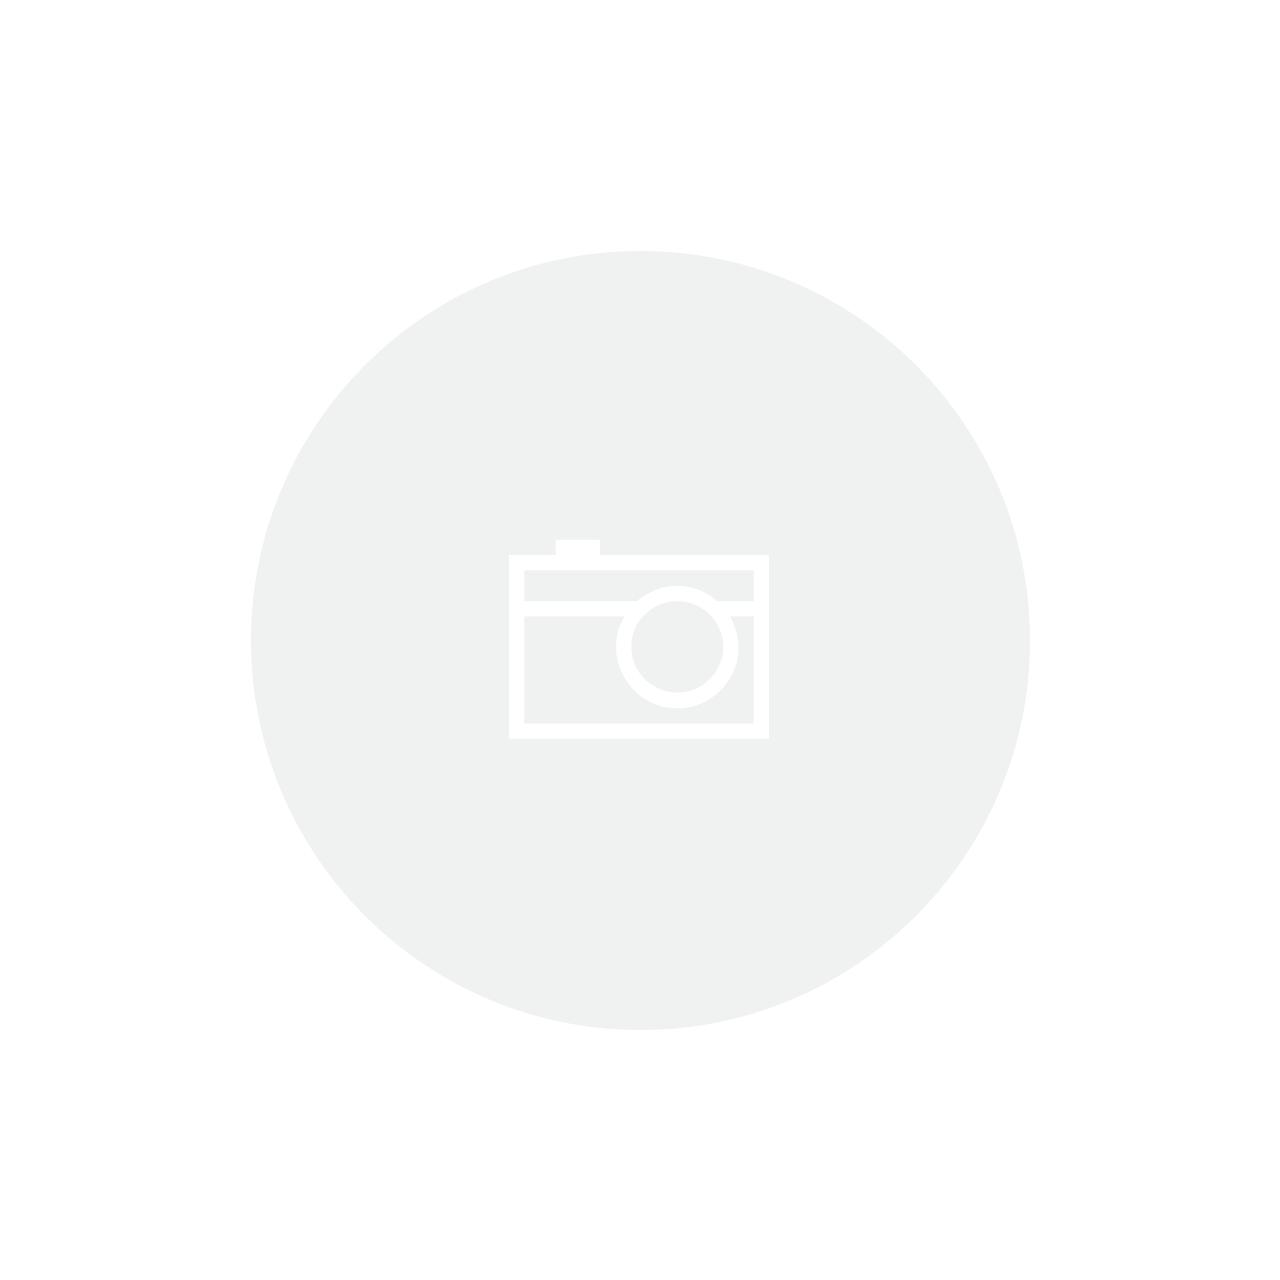 Frigideira Inox  20 cm 1,10 Litros Duo Silicone Tramontina